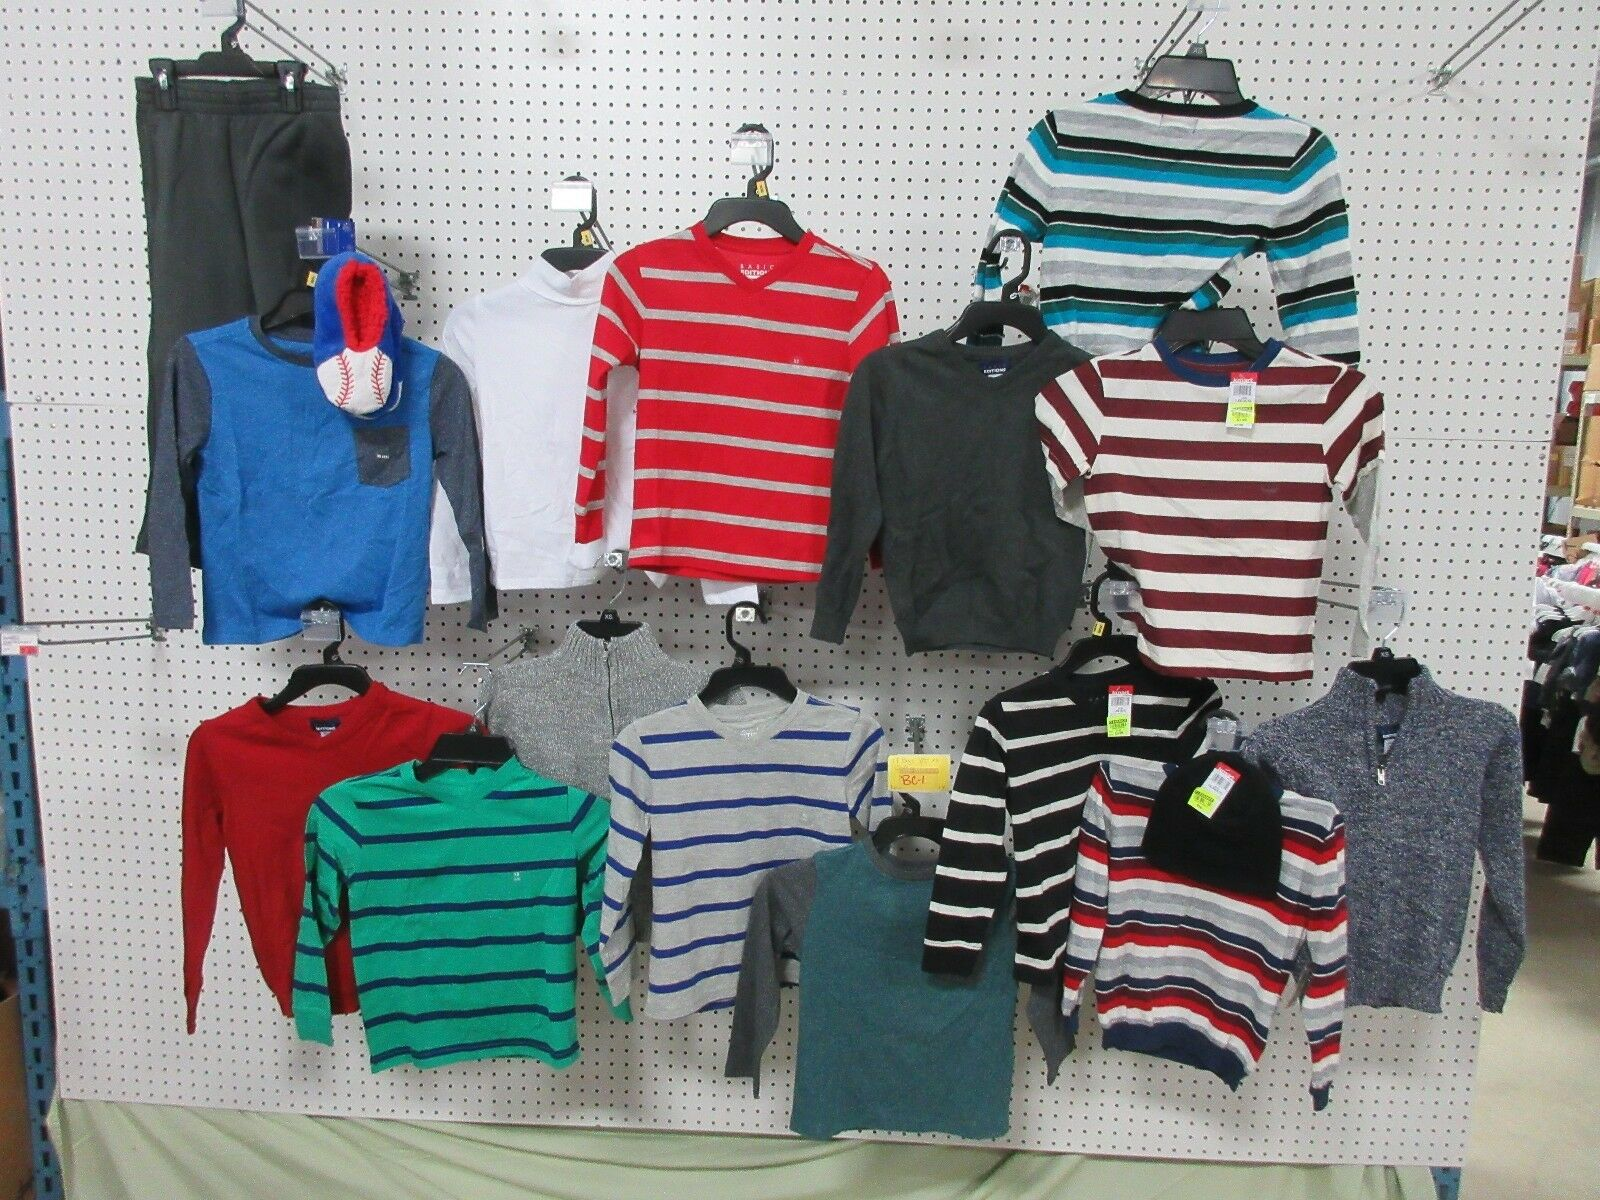 15 BOYS YOUTH 4-5 XS BASIC EDITIONS CLOTHING JOE BOXER COLLAR SHIRTS JACKET LOT